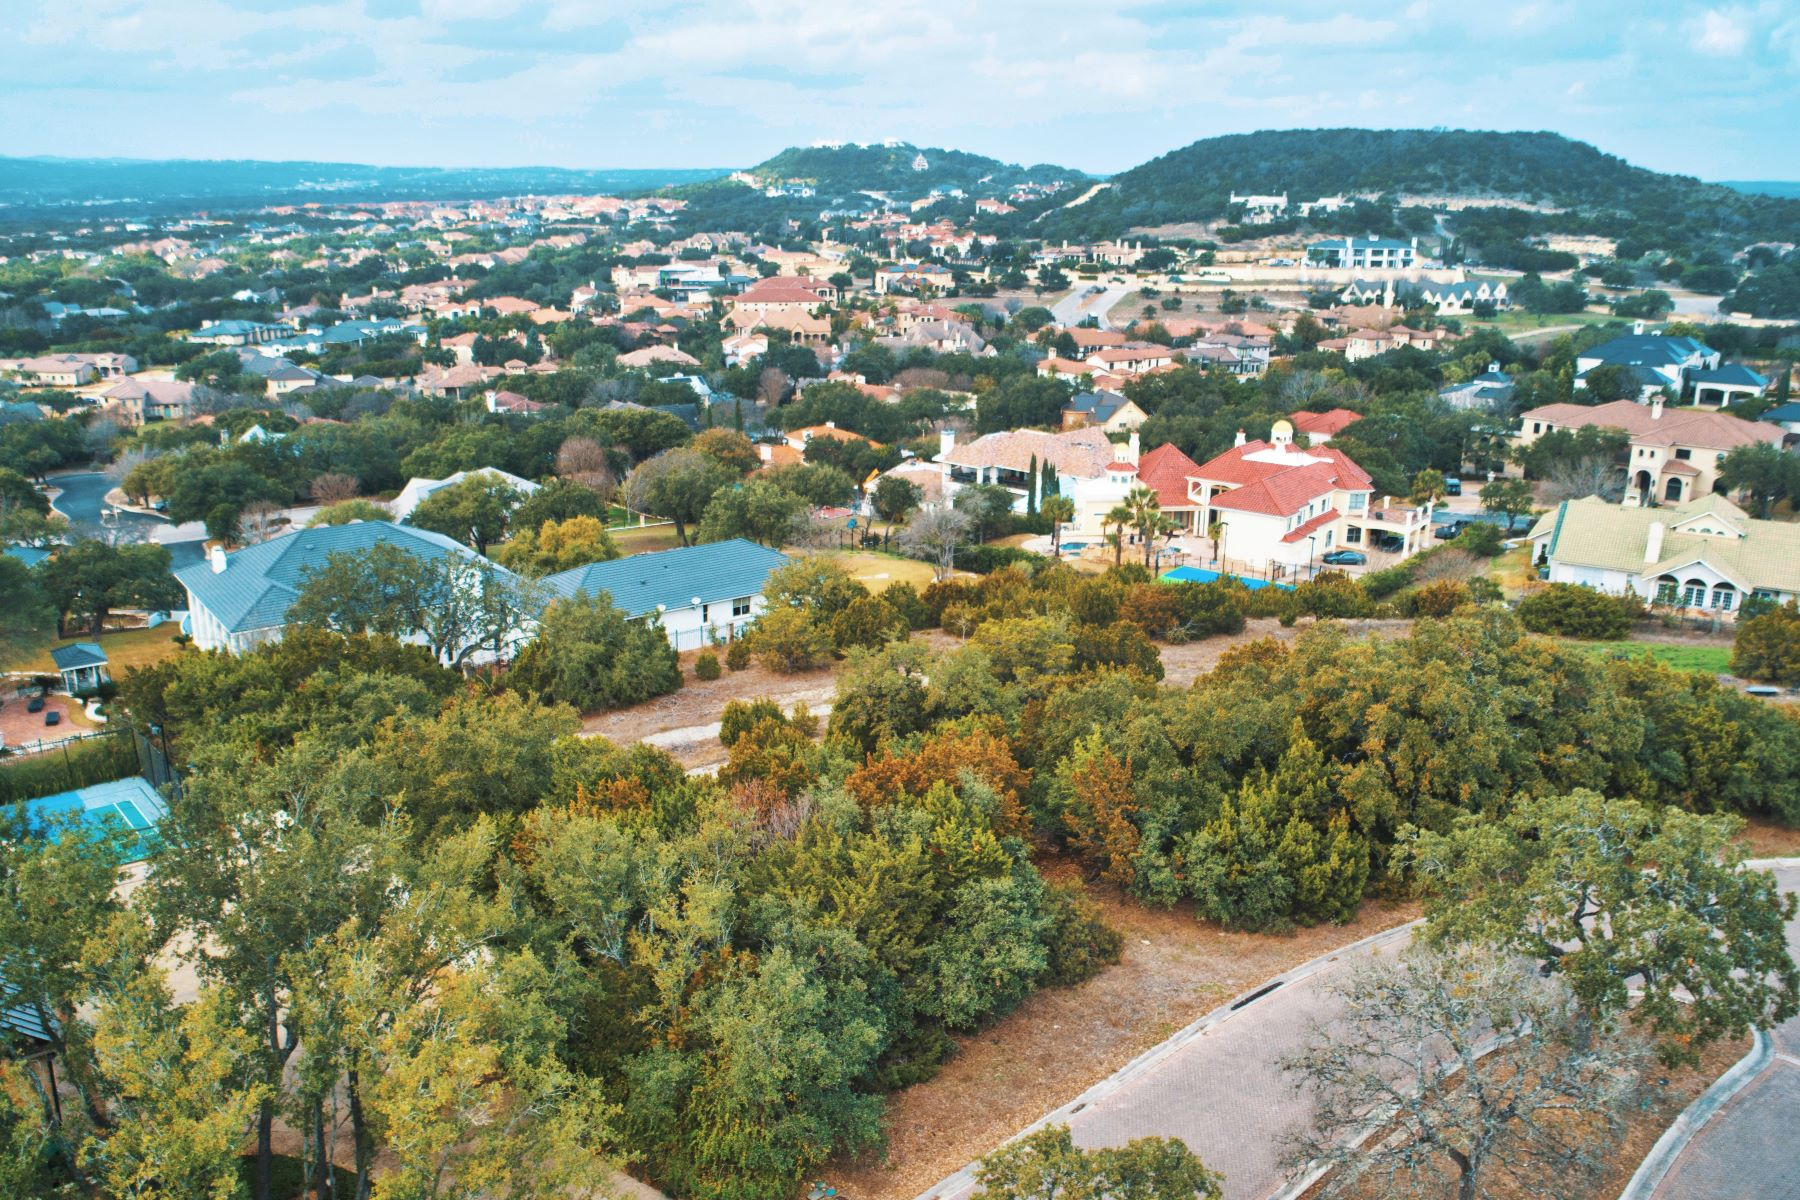 Land for Sale at Hilltop Home Site 5 Davenport Lane, San Antonio, Texas 78257 United States